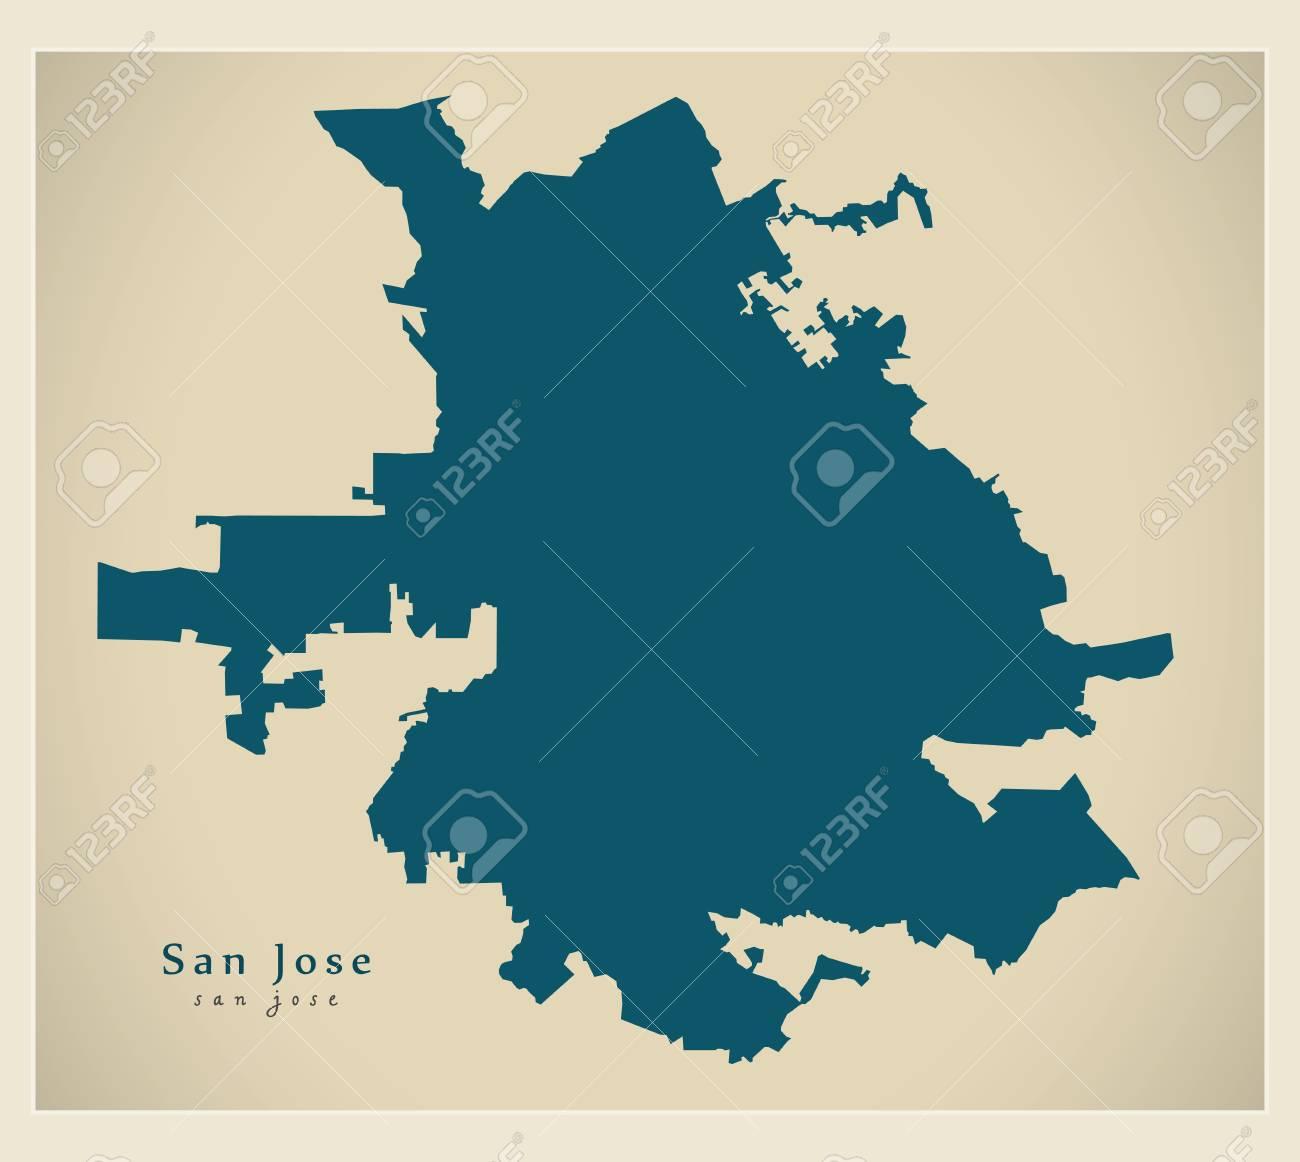 Modern Map - San Jose California USA city map on us states california cities, usa map los angeles, usa map san jose, usa map san diego, usa map oakland, usa map san francisco, usa map national city, usa map richmond, usa map sacramento, shapes california cities, zip code map california cities,